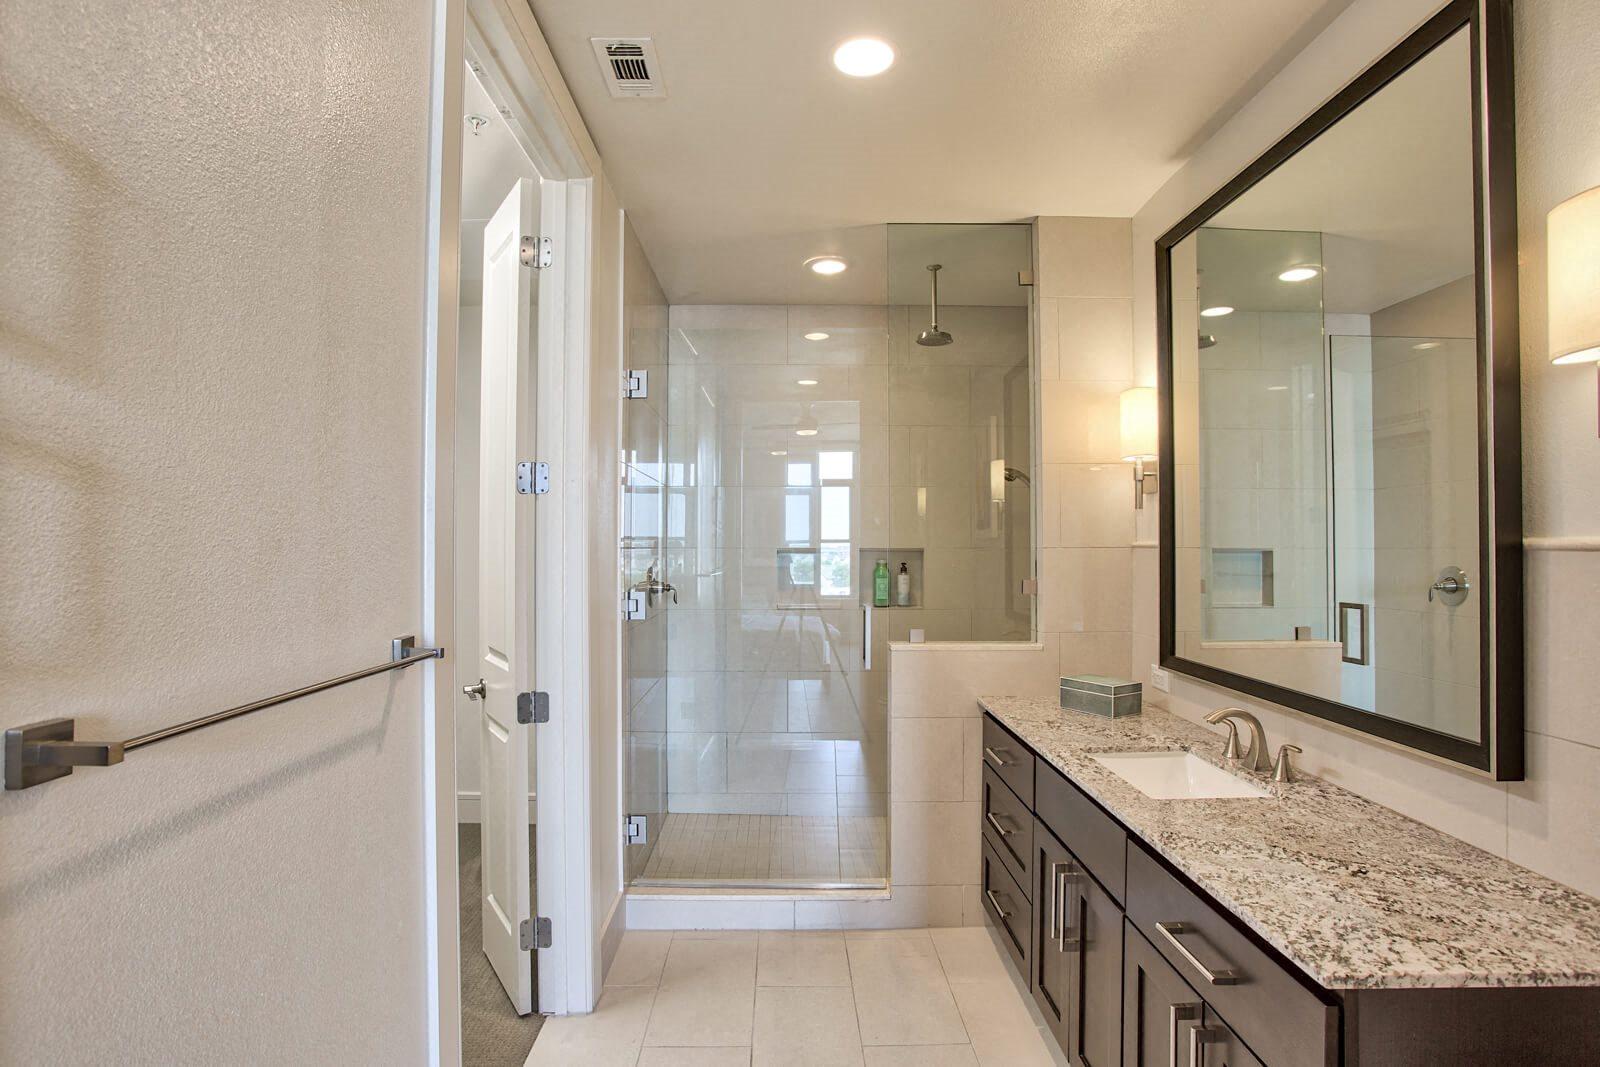 Spacious, Modern Bathrooms at The Jordan by Windsor, Texas, 75201